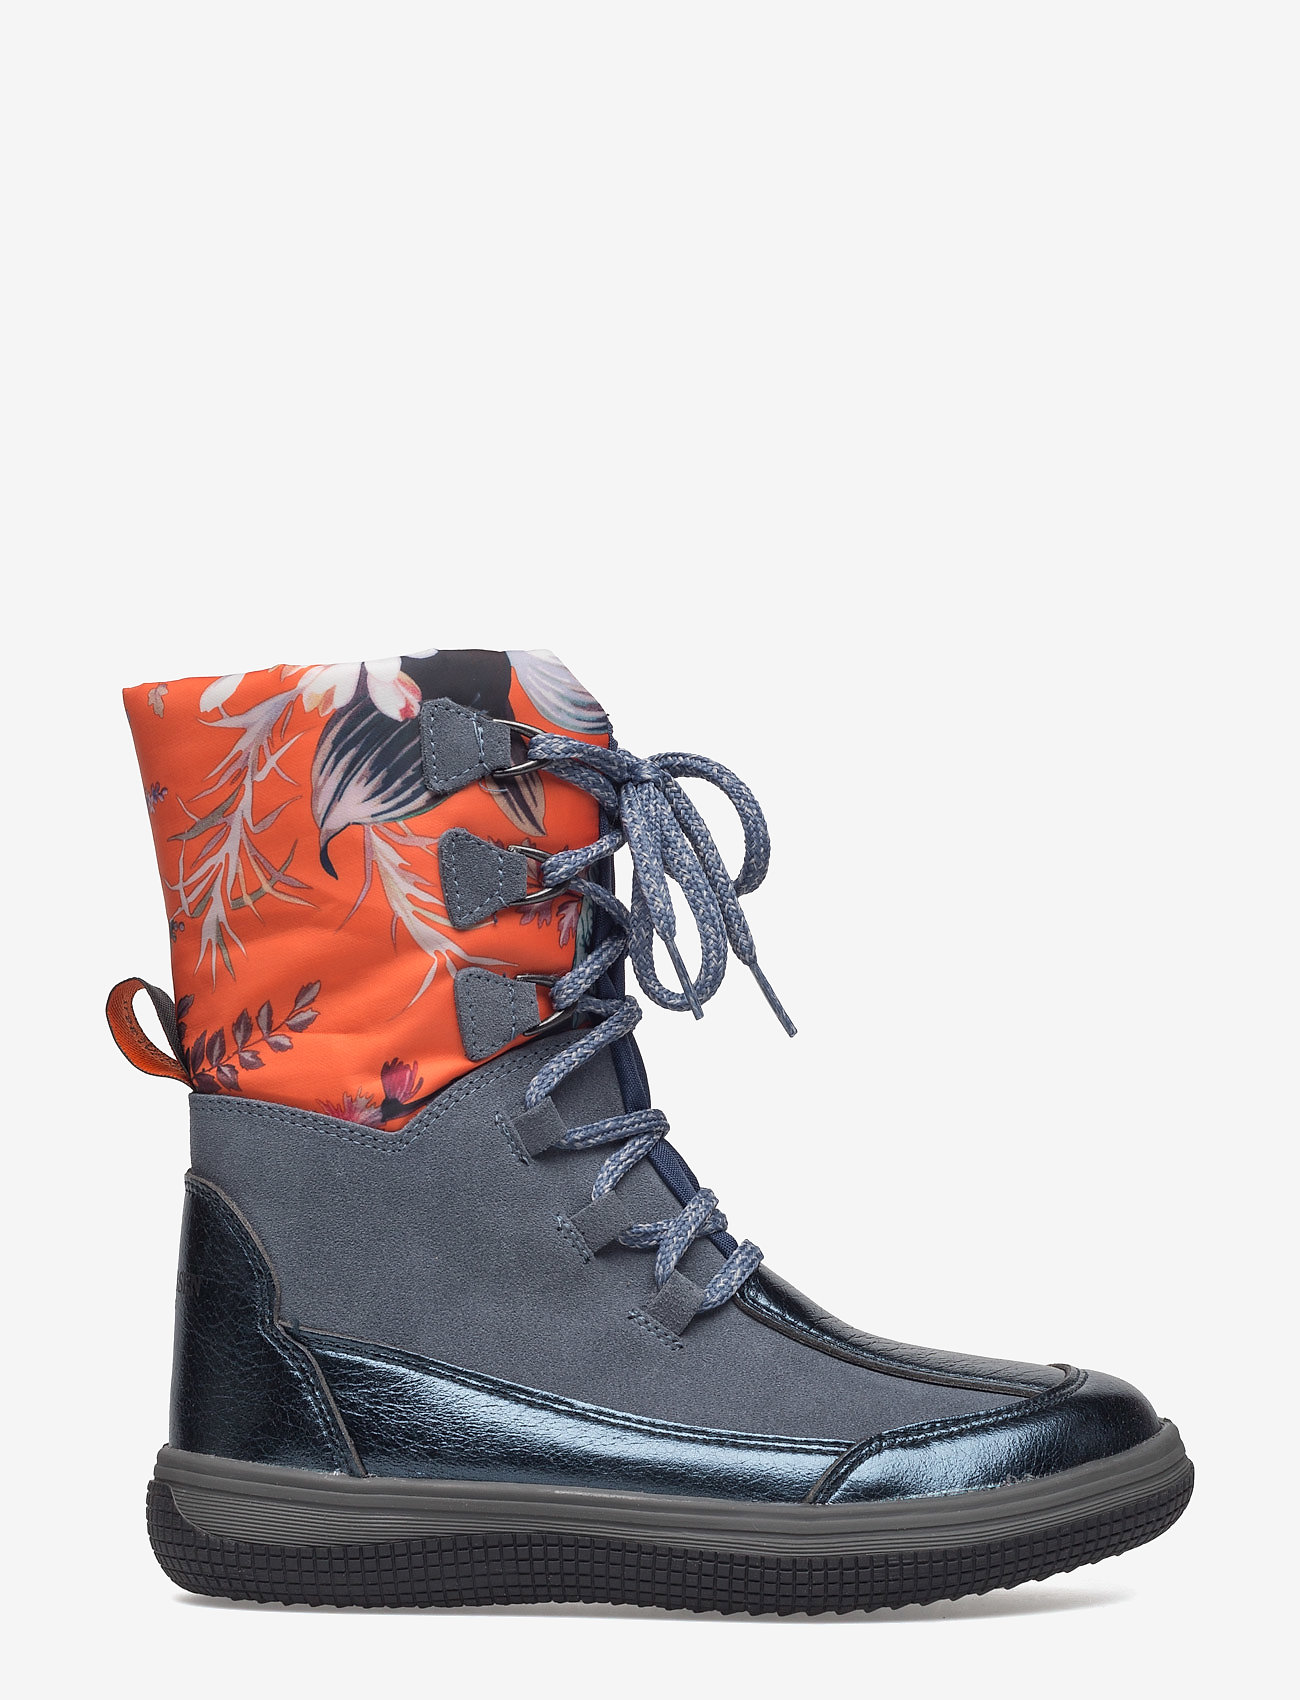 Warm Boot (654 Bluestone) - Ilse Jacobsen uFK6xI